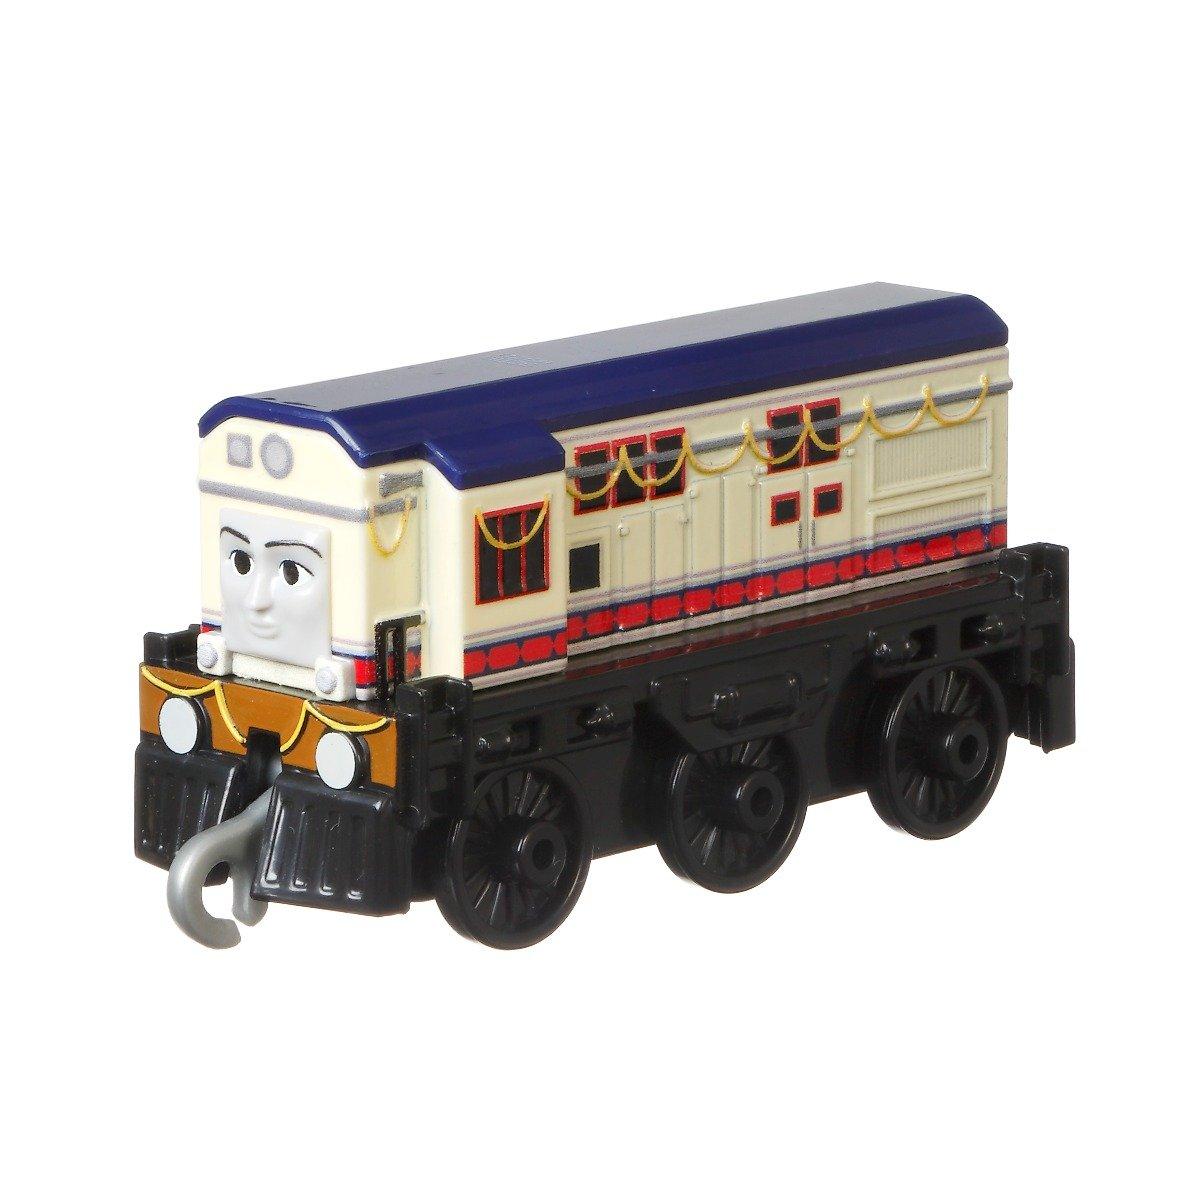 Locomotiva Thomas and Friends, Noor Jehan GHK68